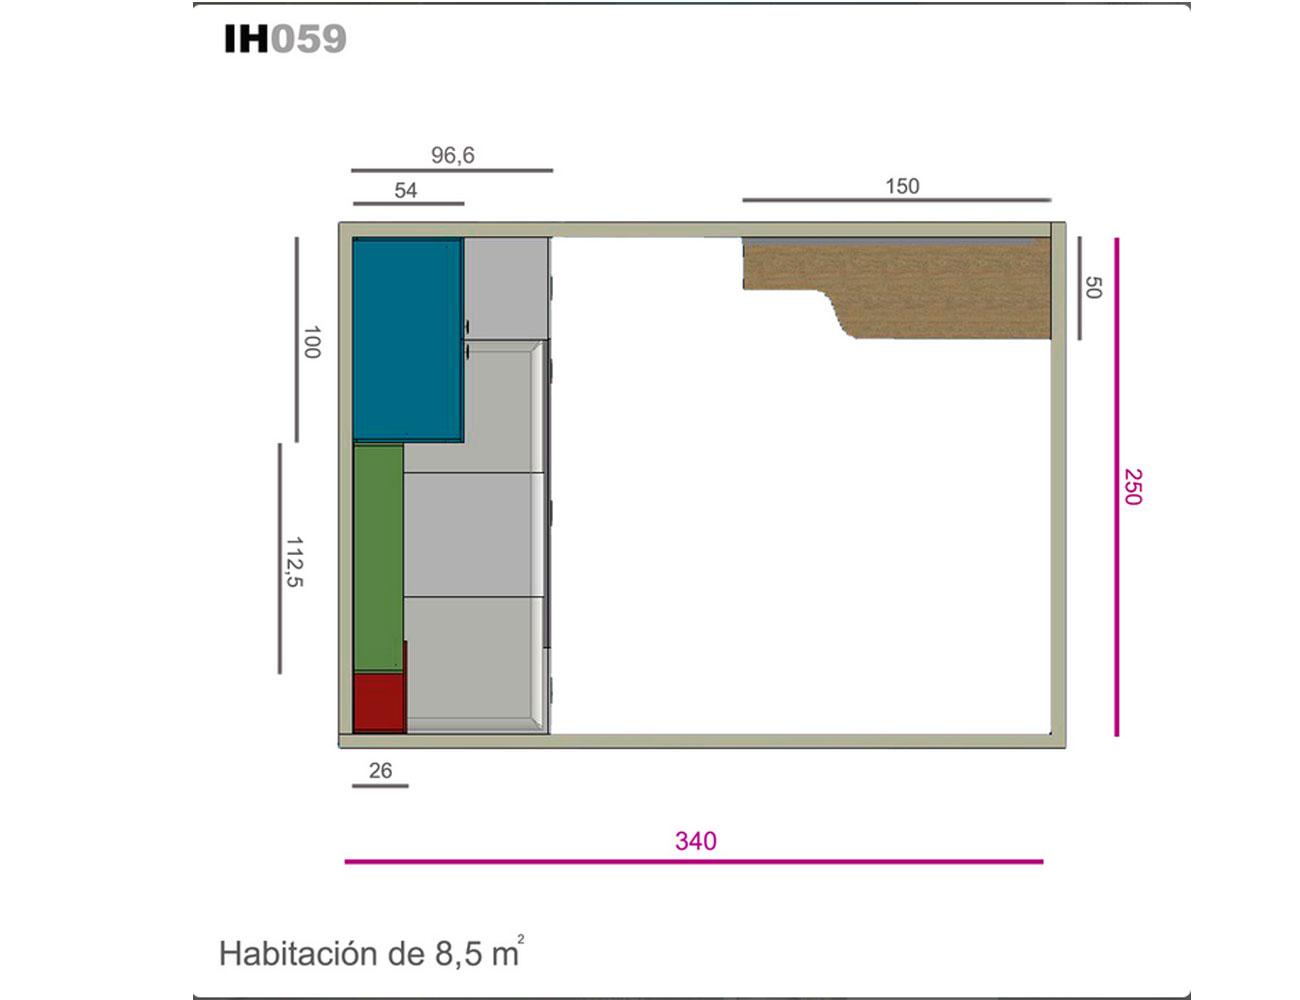 Ih059 medidas